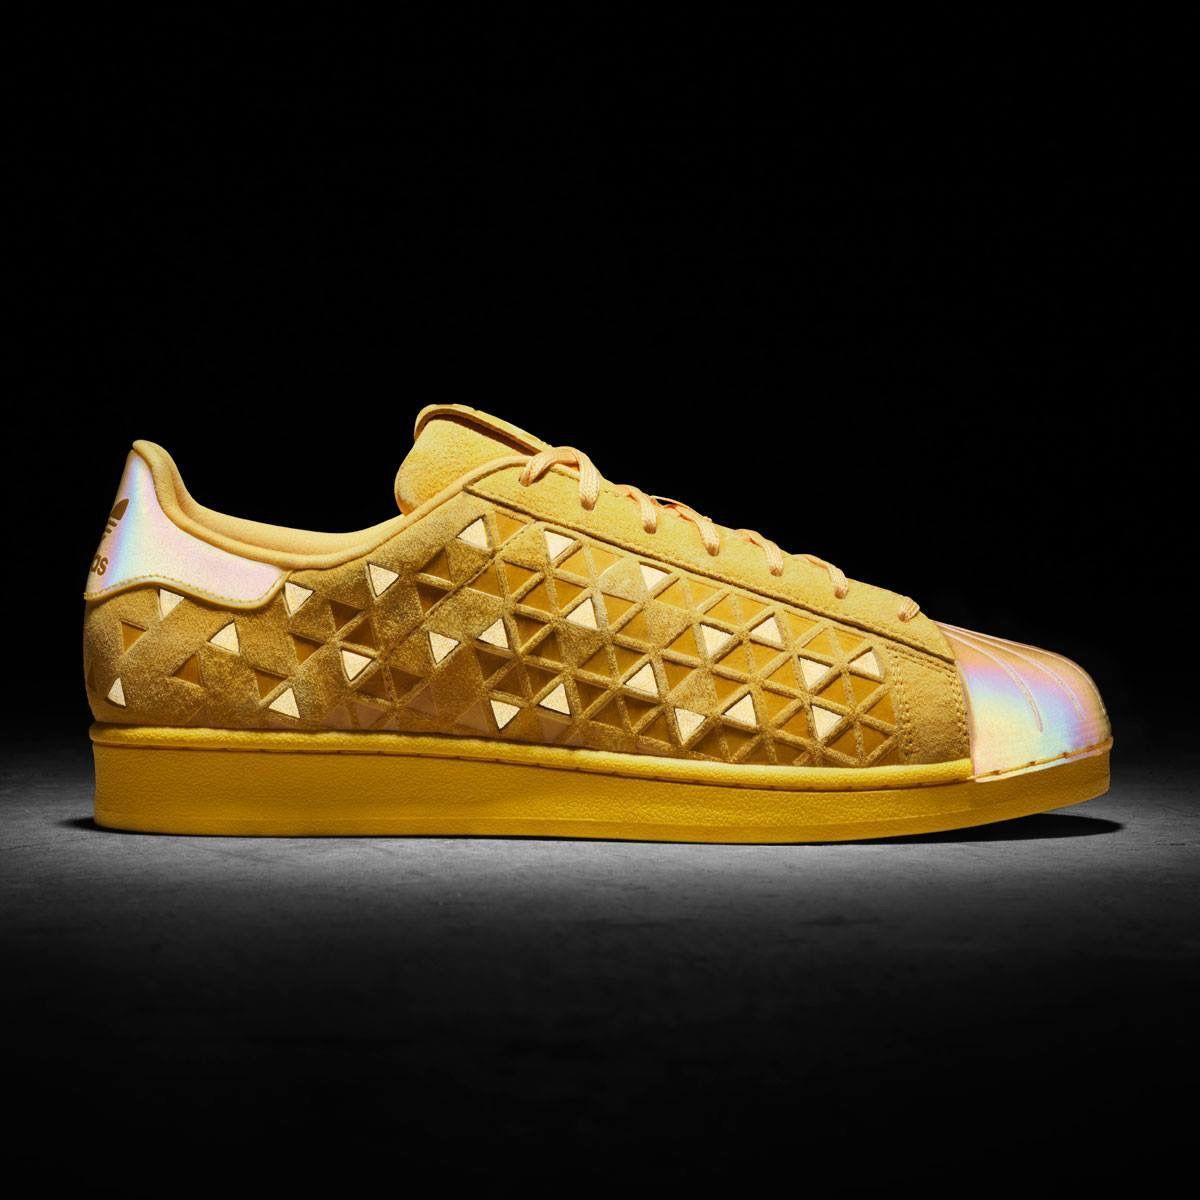 adidas Originals Superstar Xeno | Adidas shoes originals, Sneakers ...